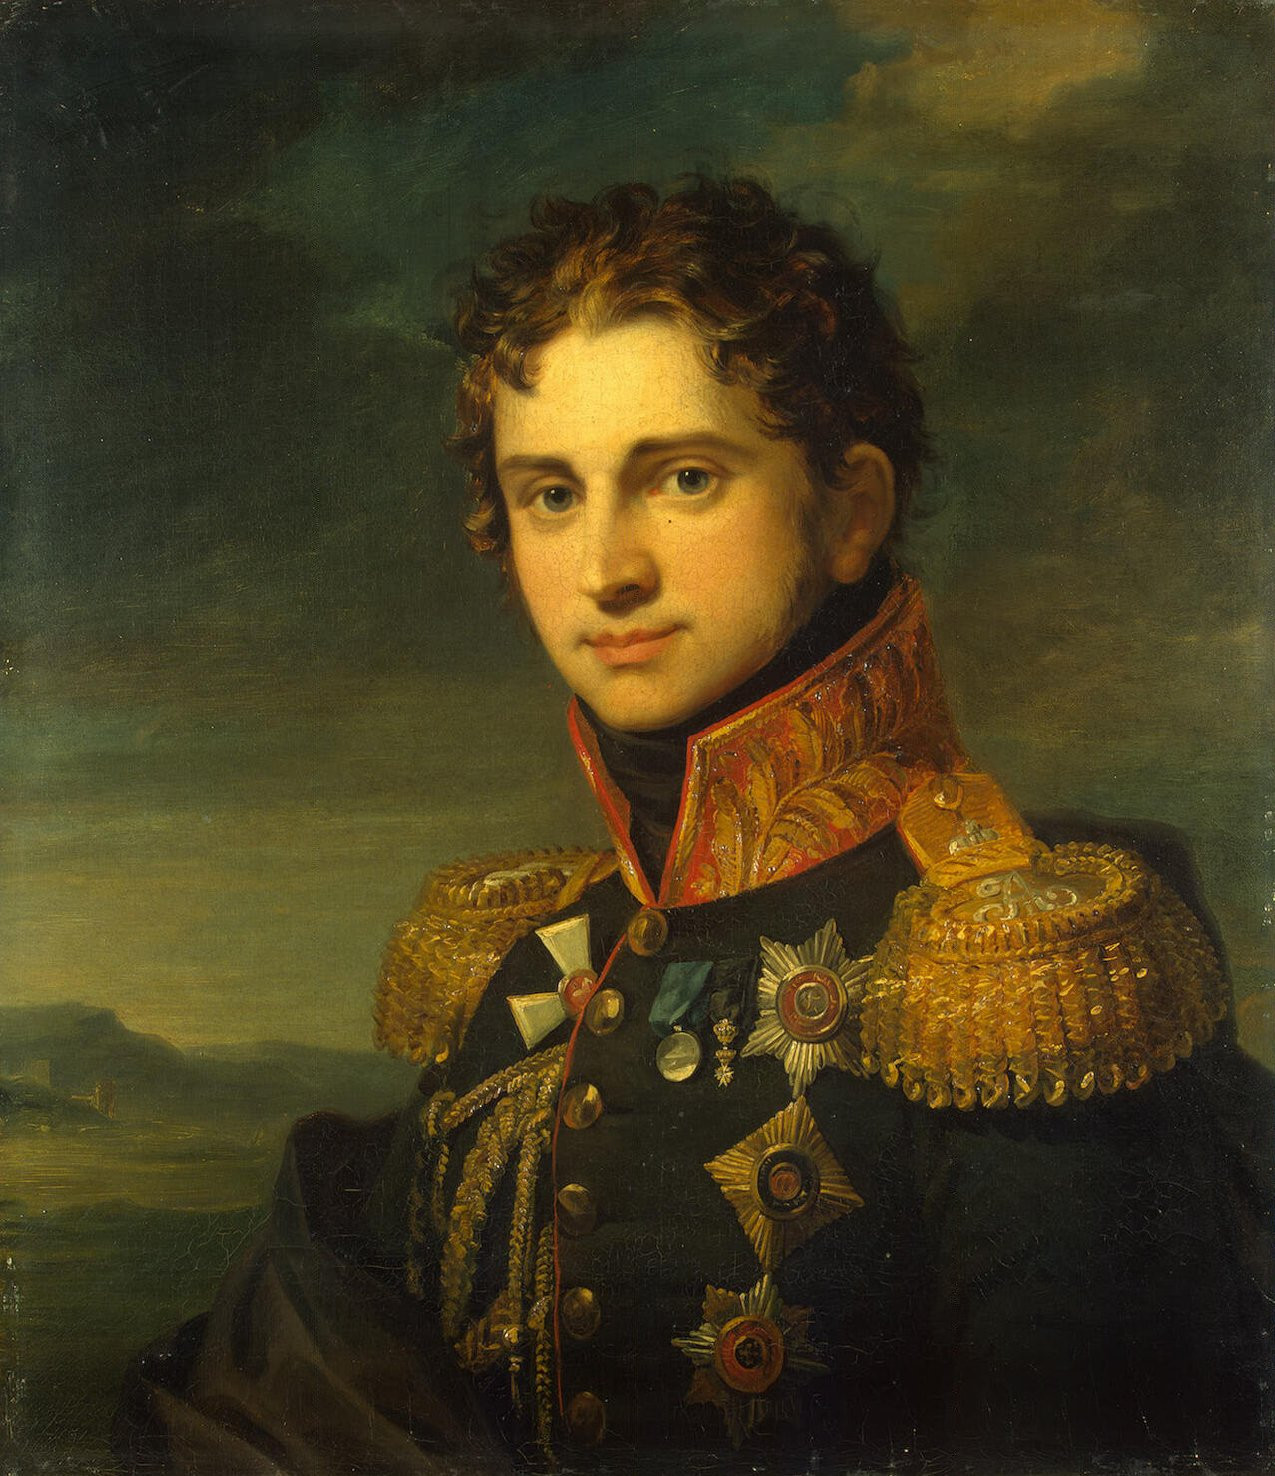 Строганов, Павел Александрович